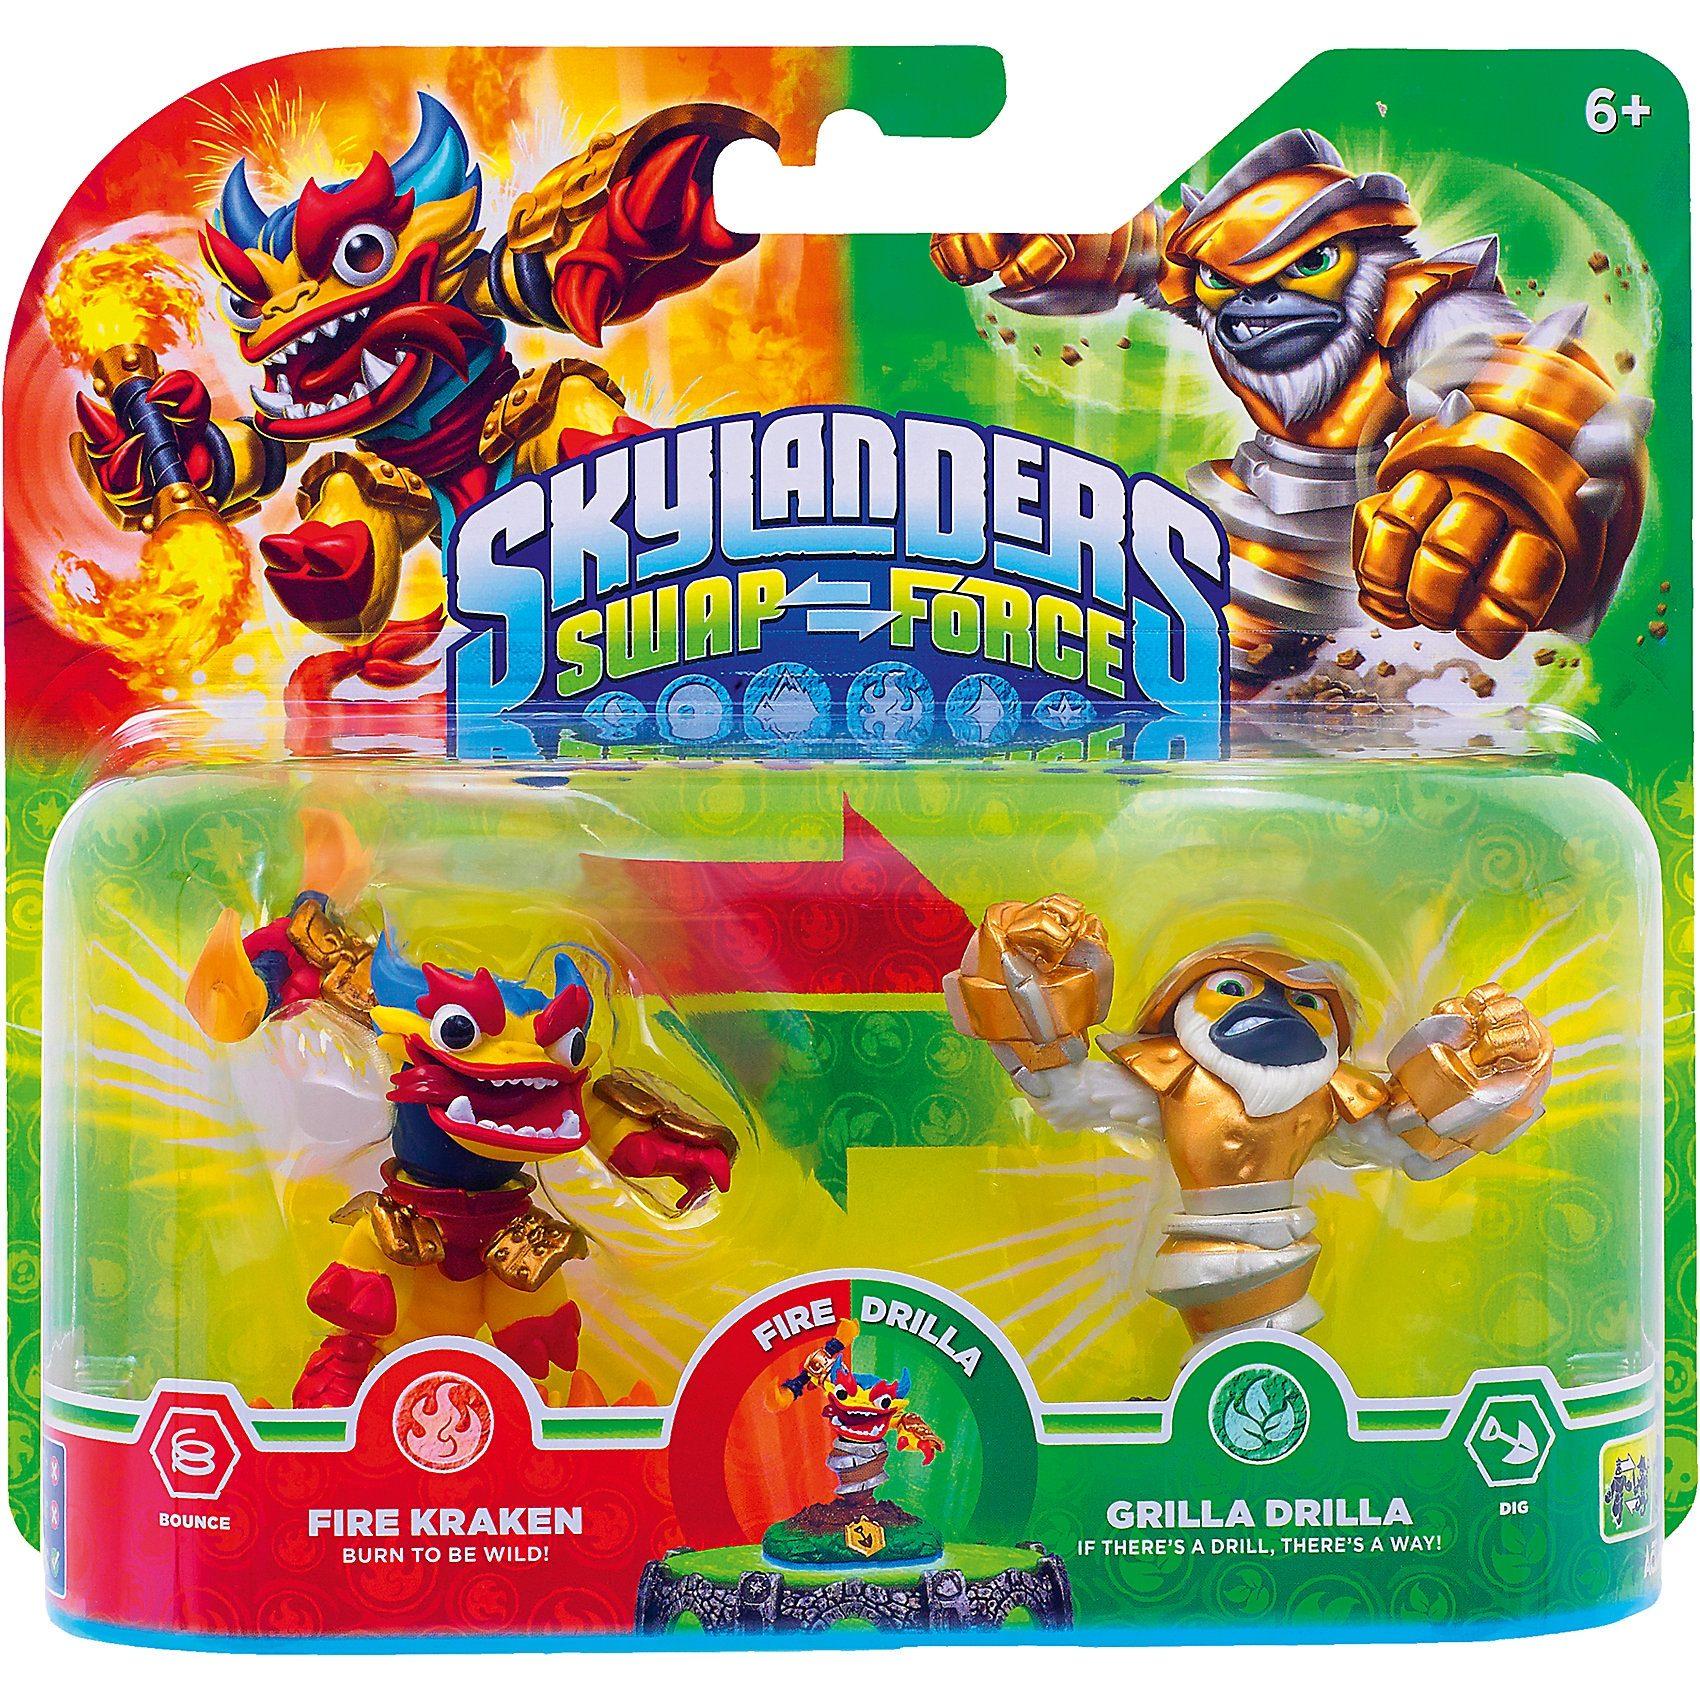 ak tronic Skylanders Swap Force 2er Pack (Free Kraken + Grilla Drilla)